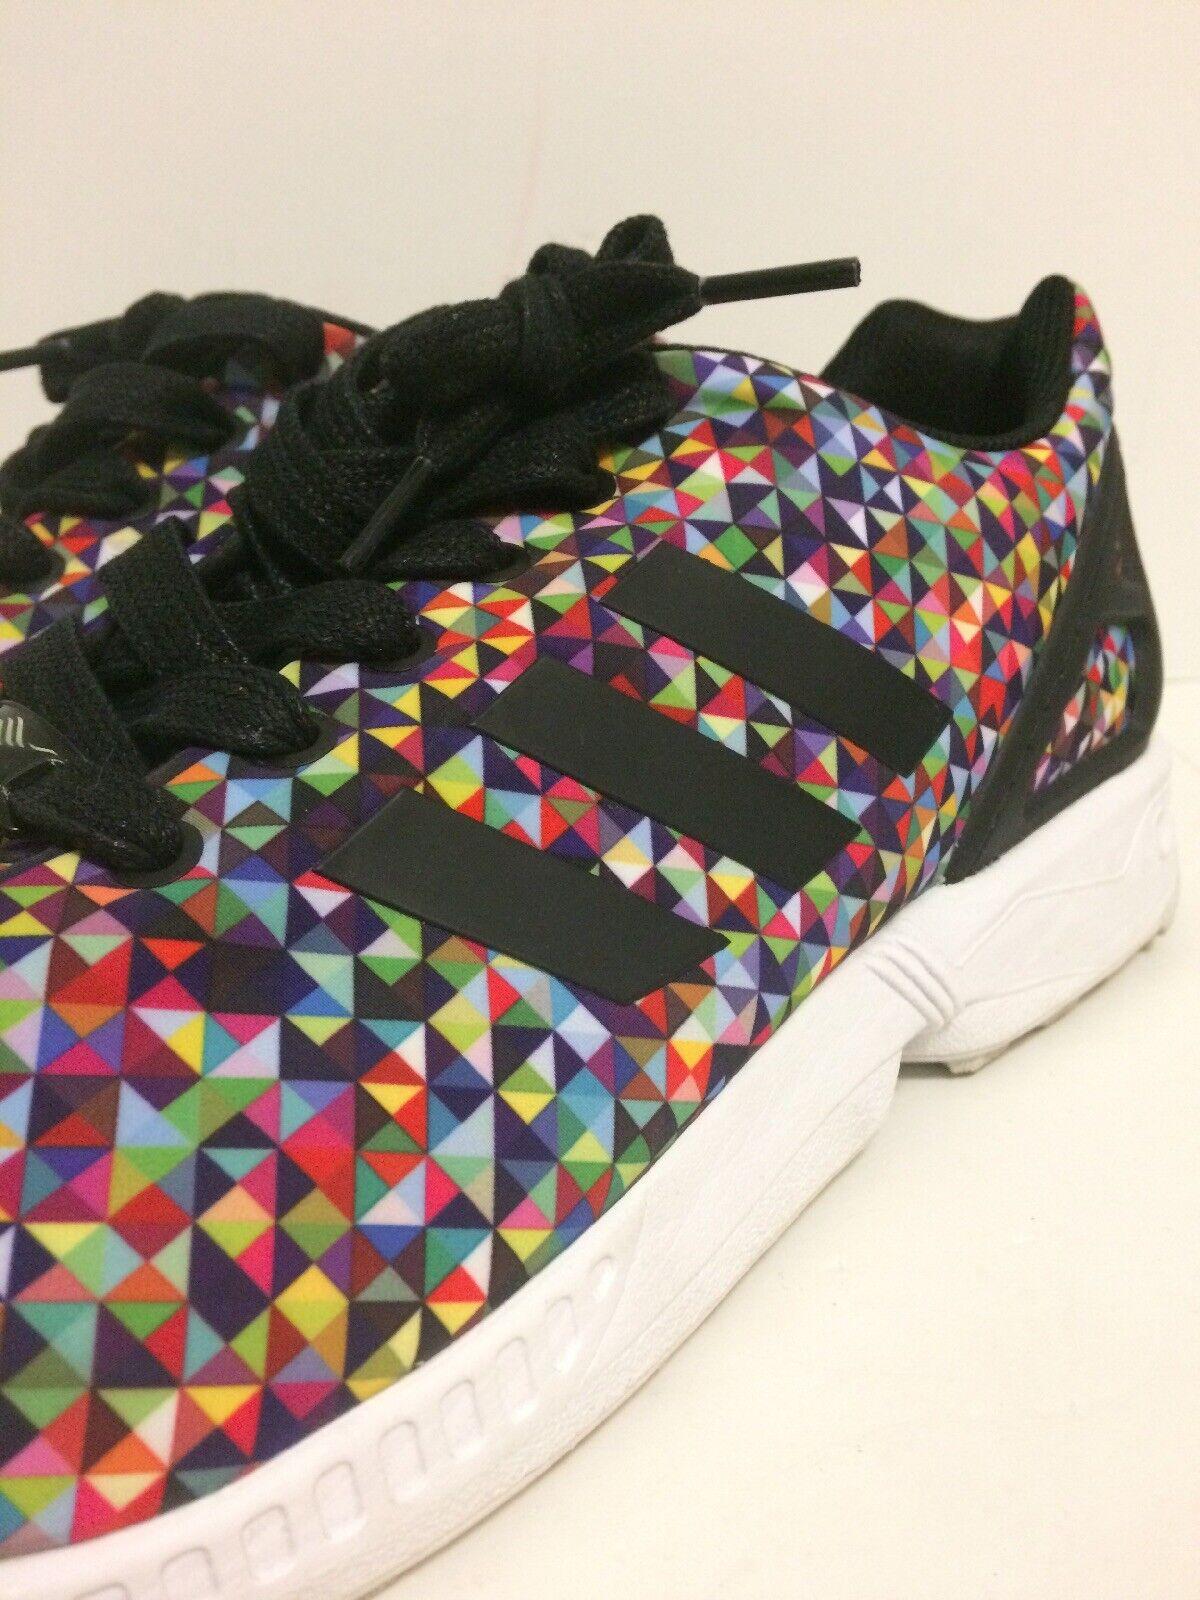 Adidas ZX Flux Multi color Prism Rainbow Boost Multicolor S81604 Xeno VNDS 11.5